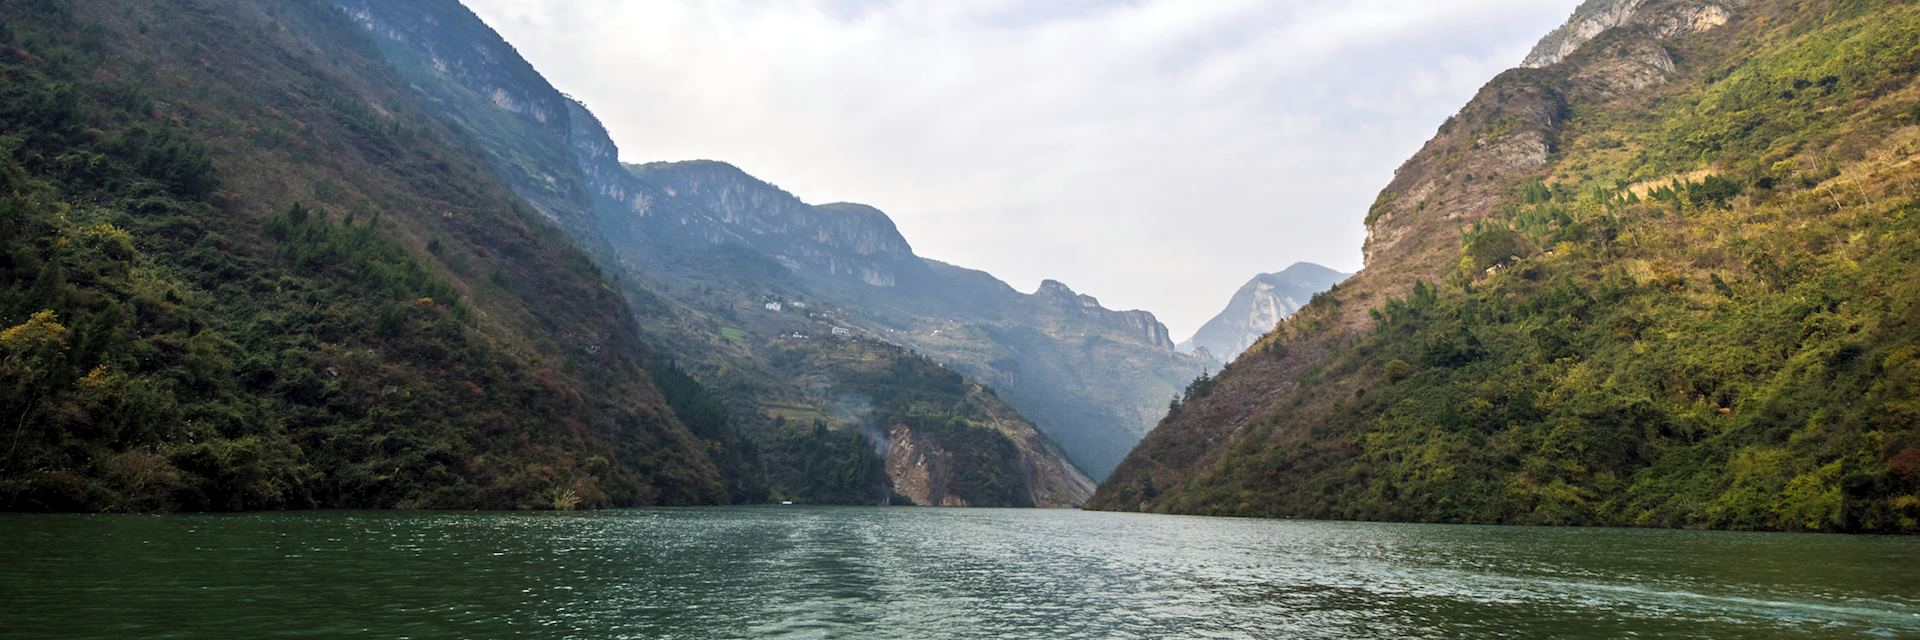 Wu Gorge on the Yangtze River